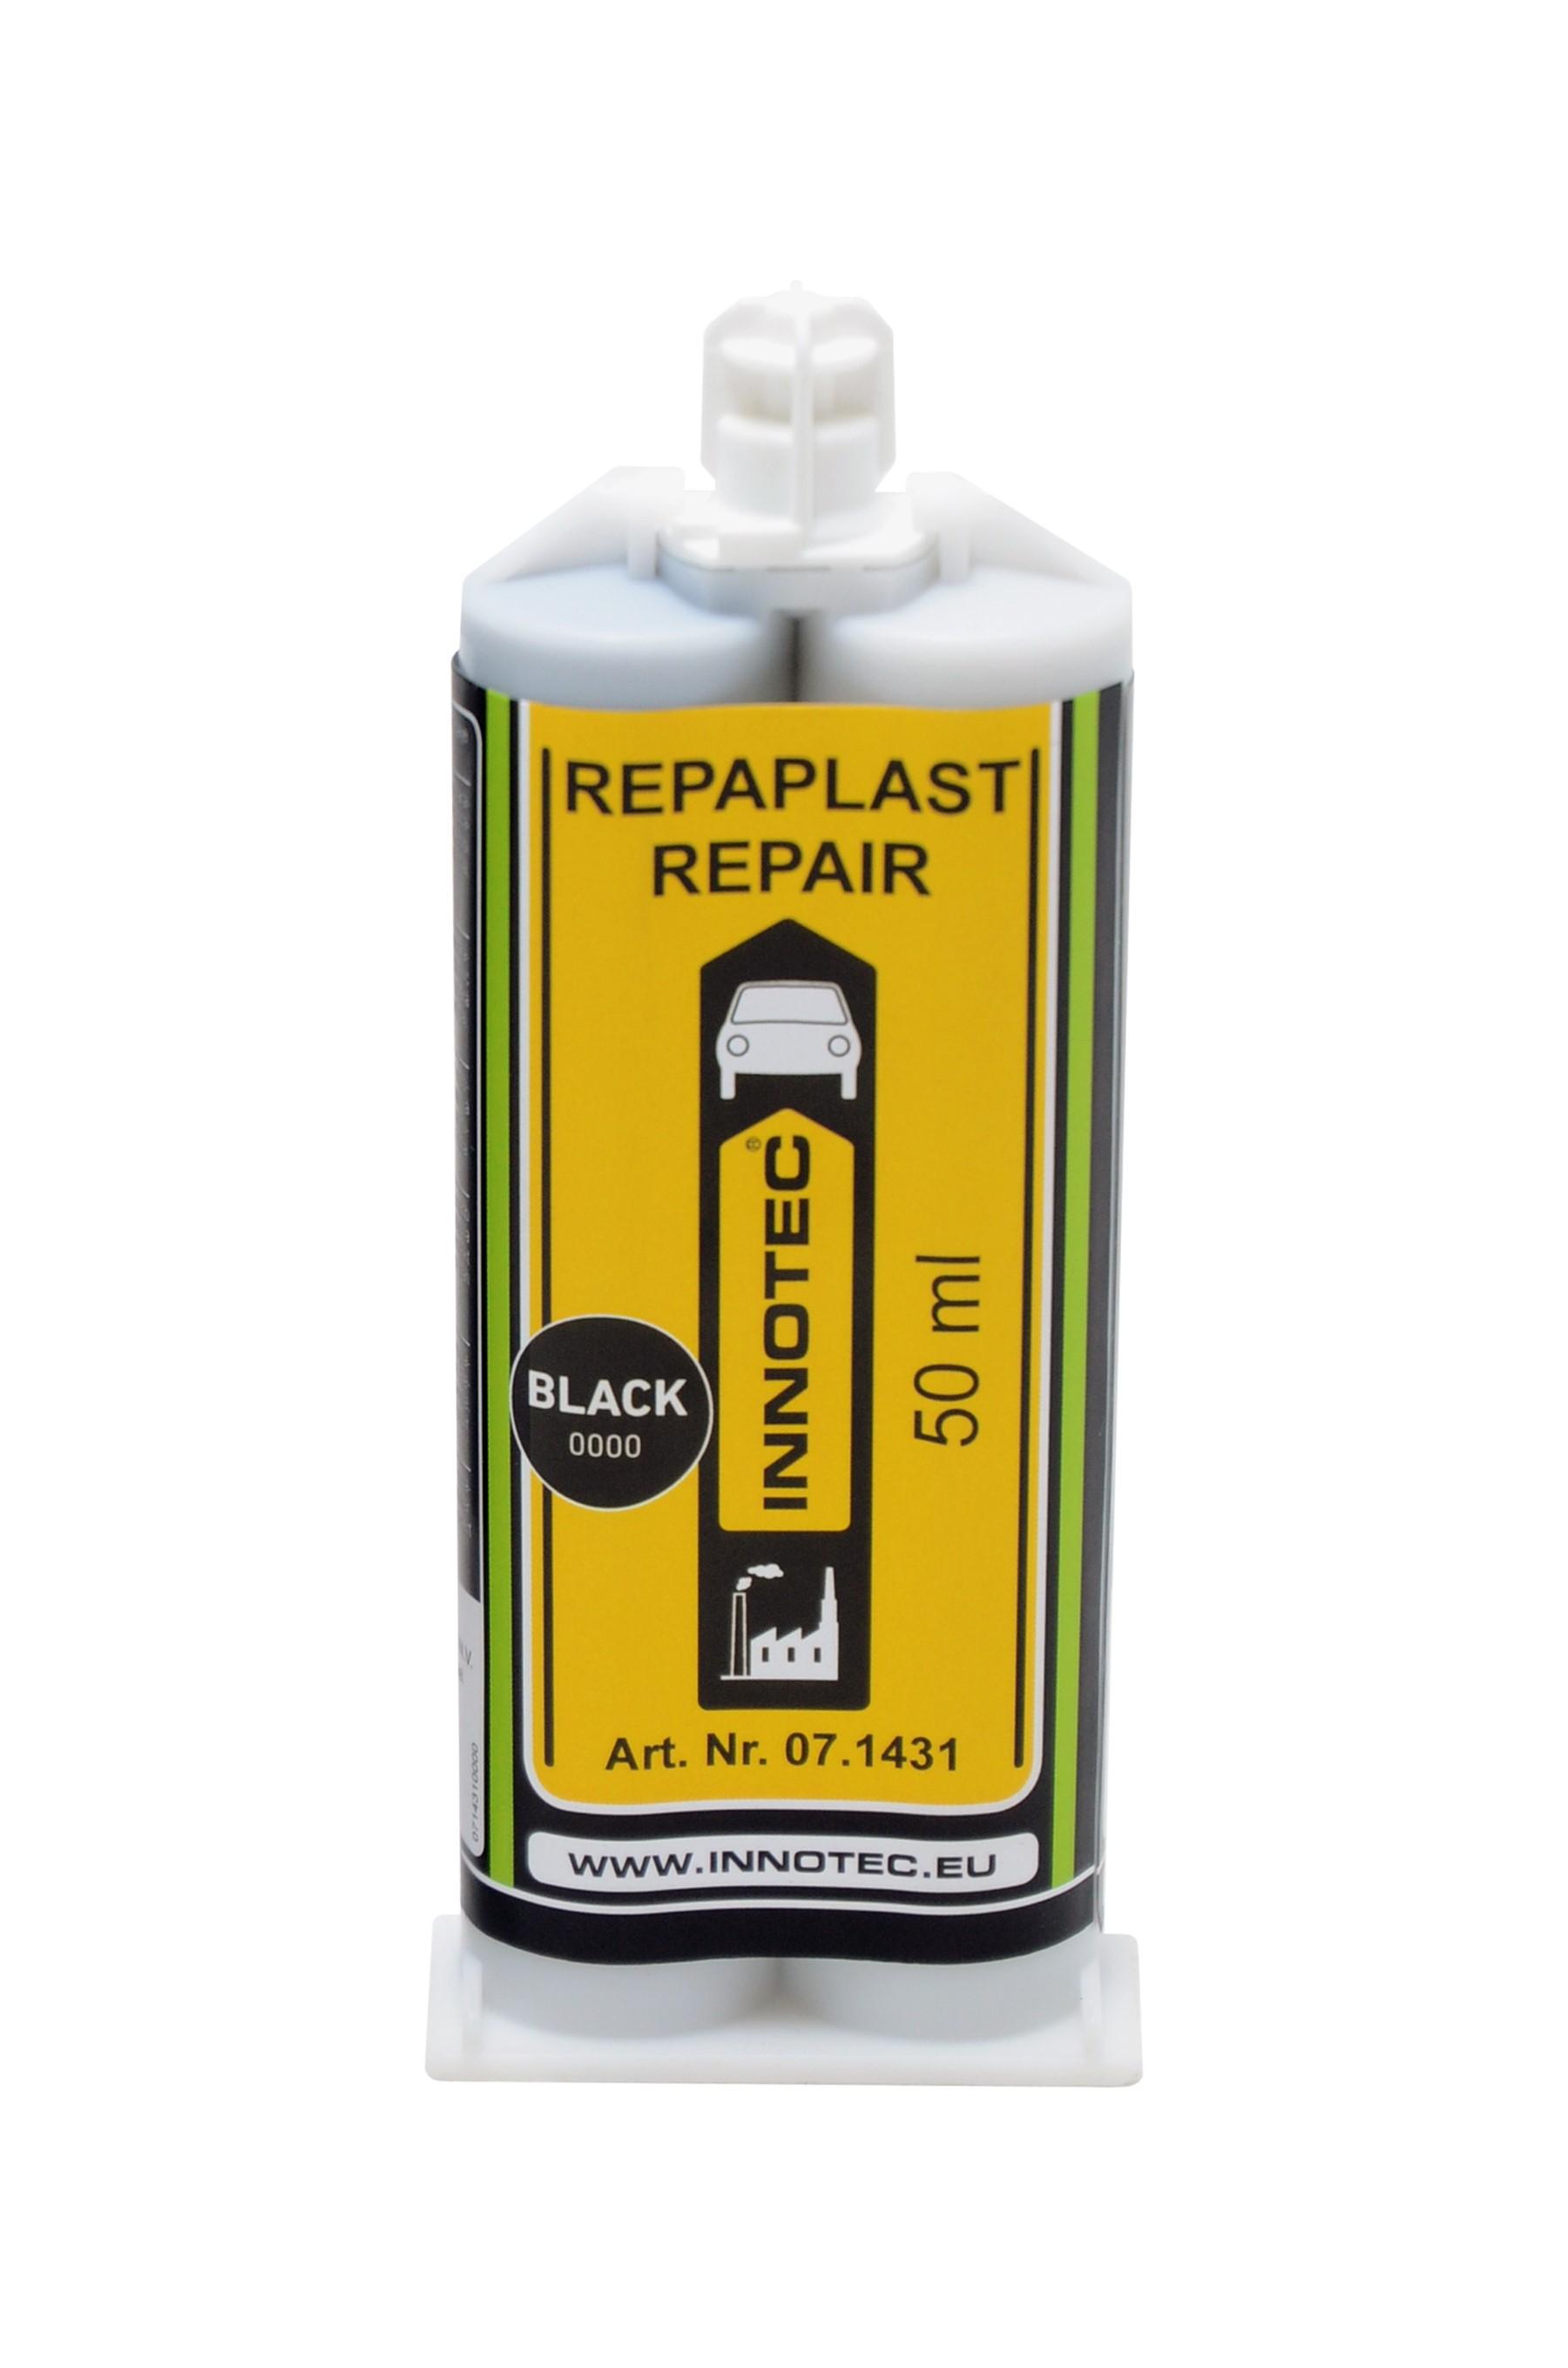 1897_Repaplast_repair_Black.jpg